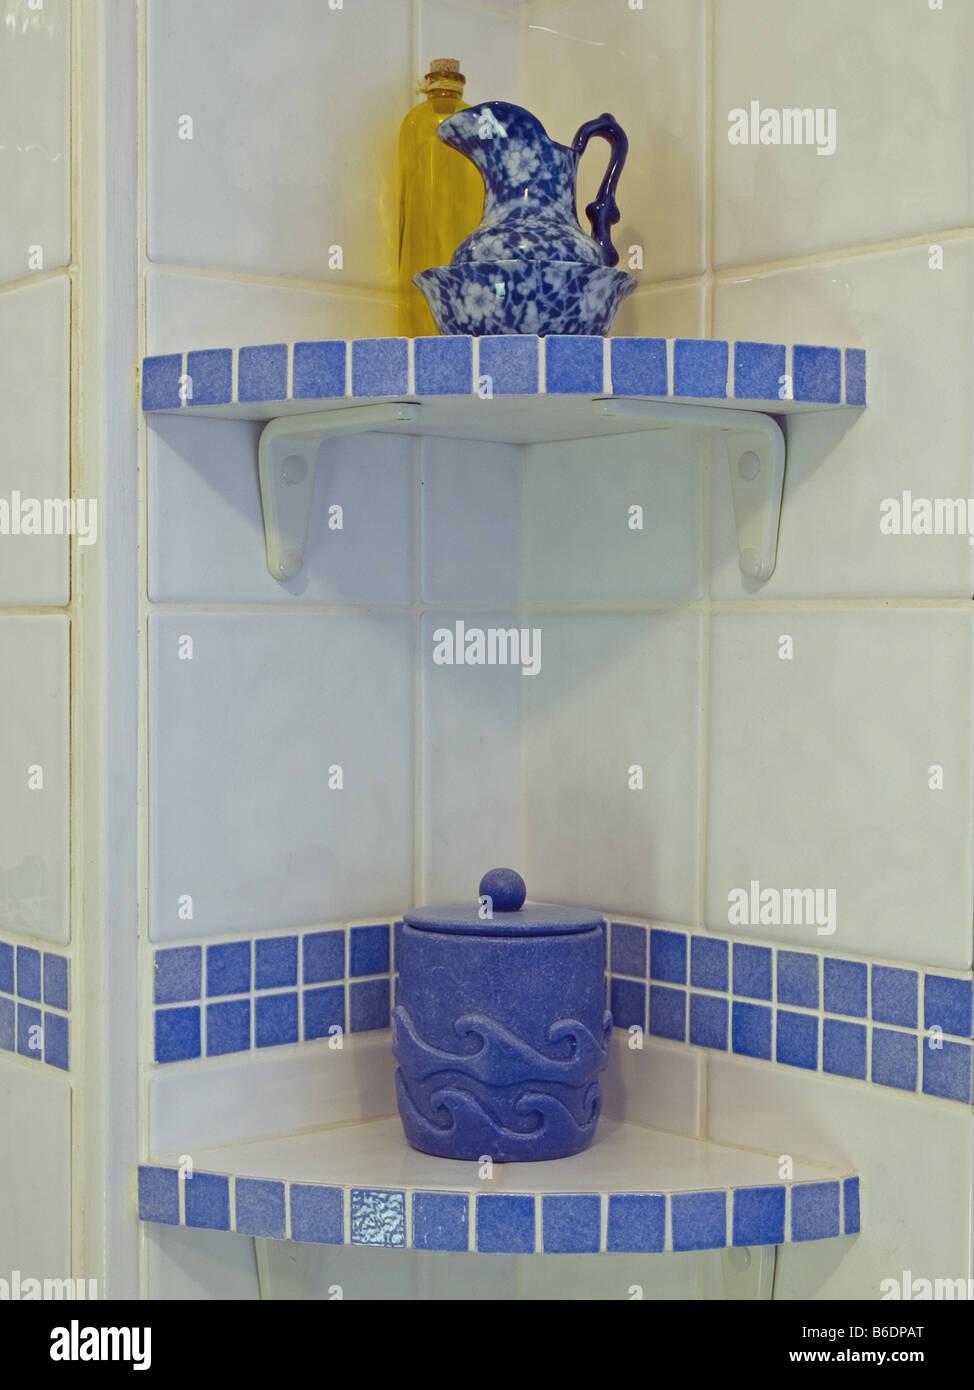 Bathroom Shelves Ceramic Tiles Stock Photo 21201232 Alamy